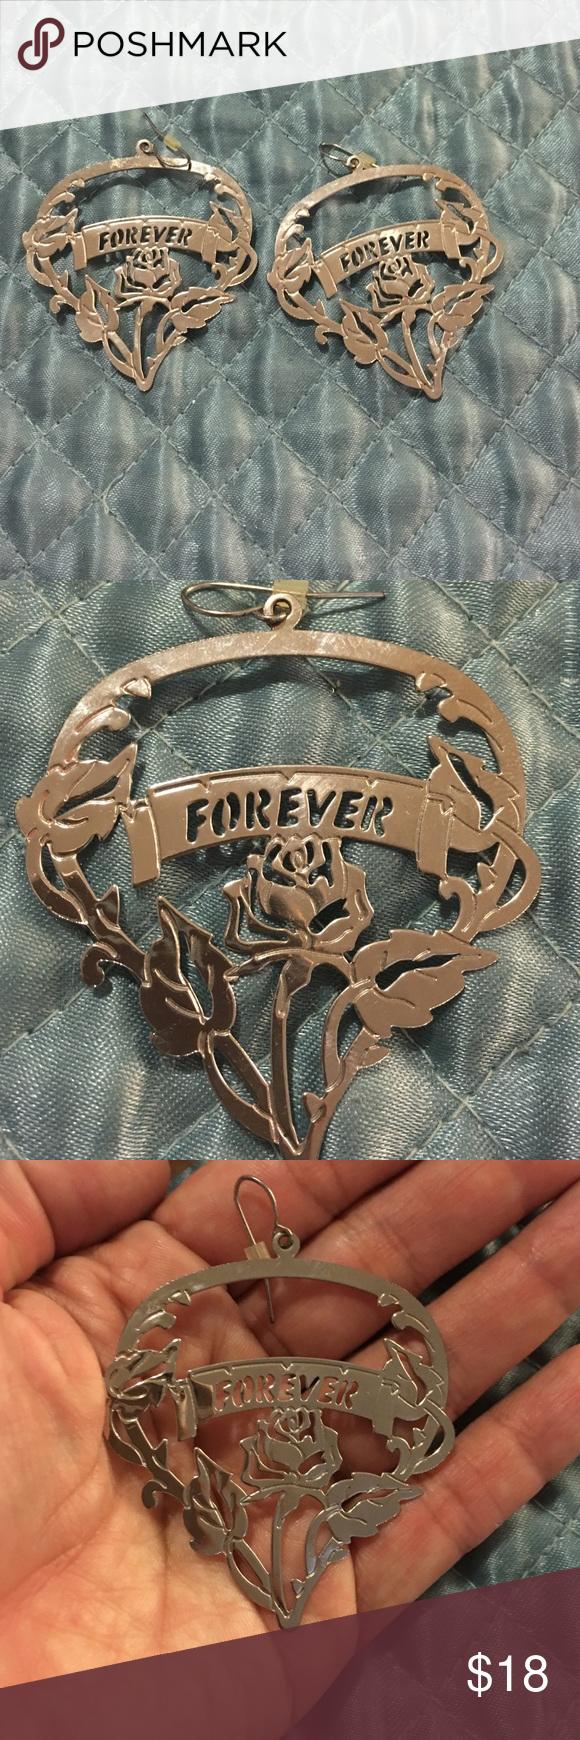 Adorable forever engraved earrings Forced engraved silver earrings Jewelry Earrings